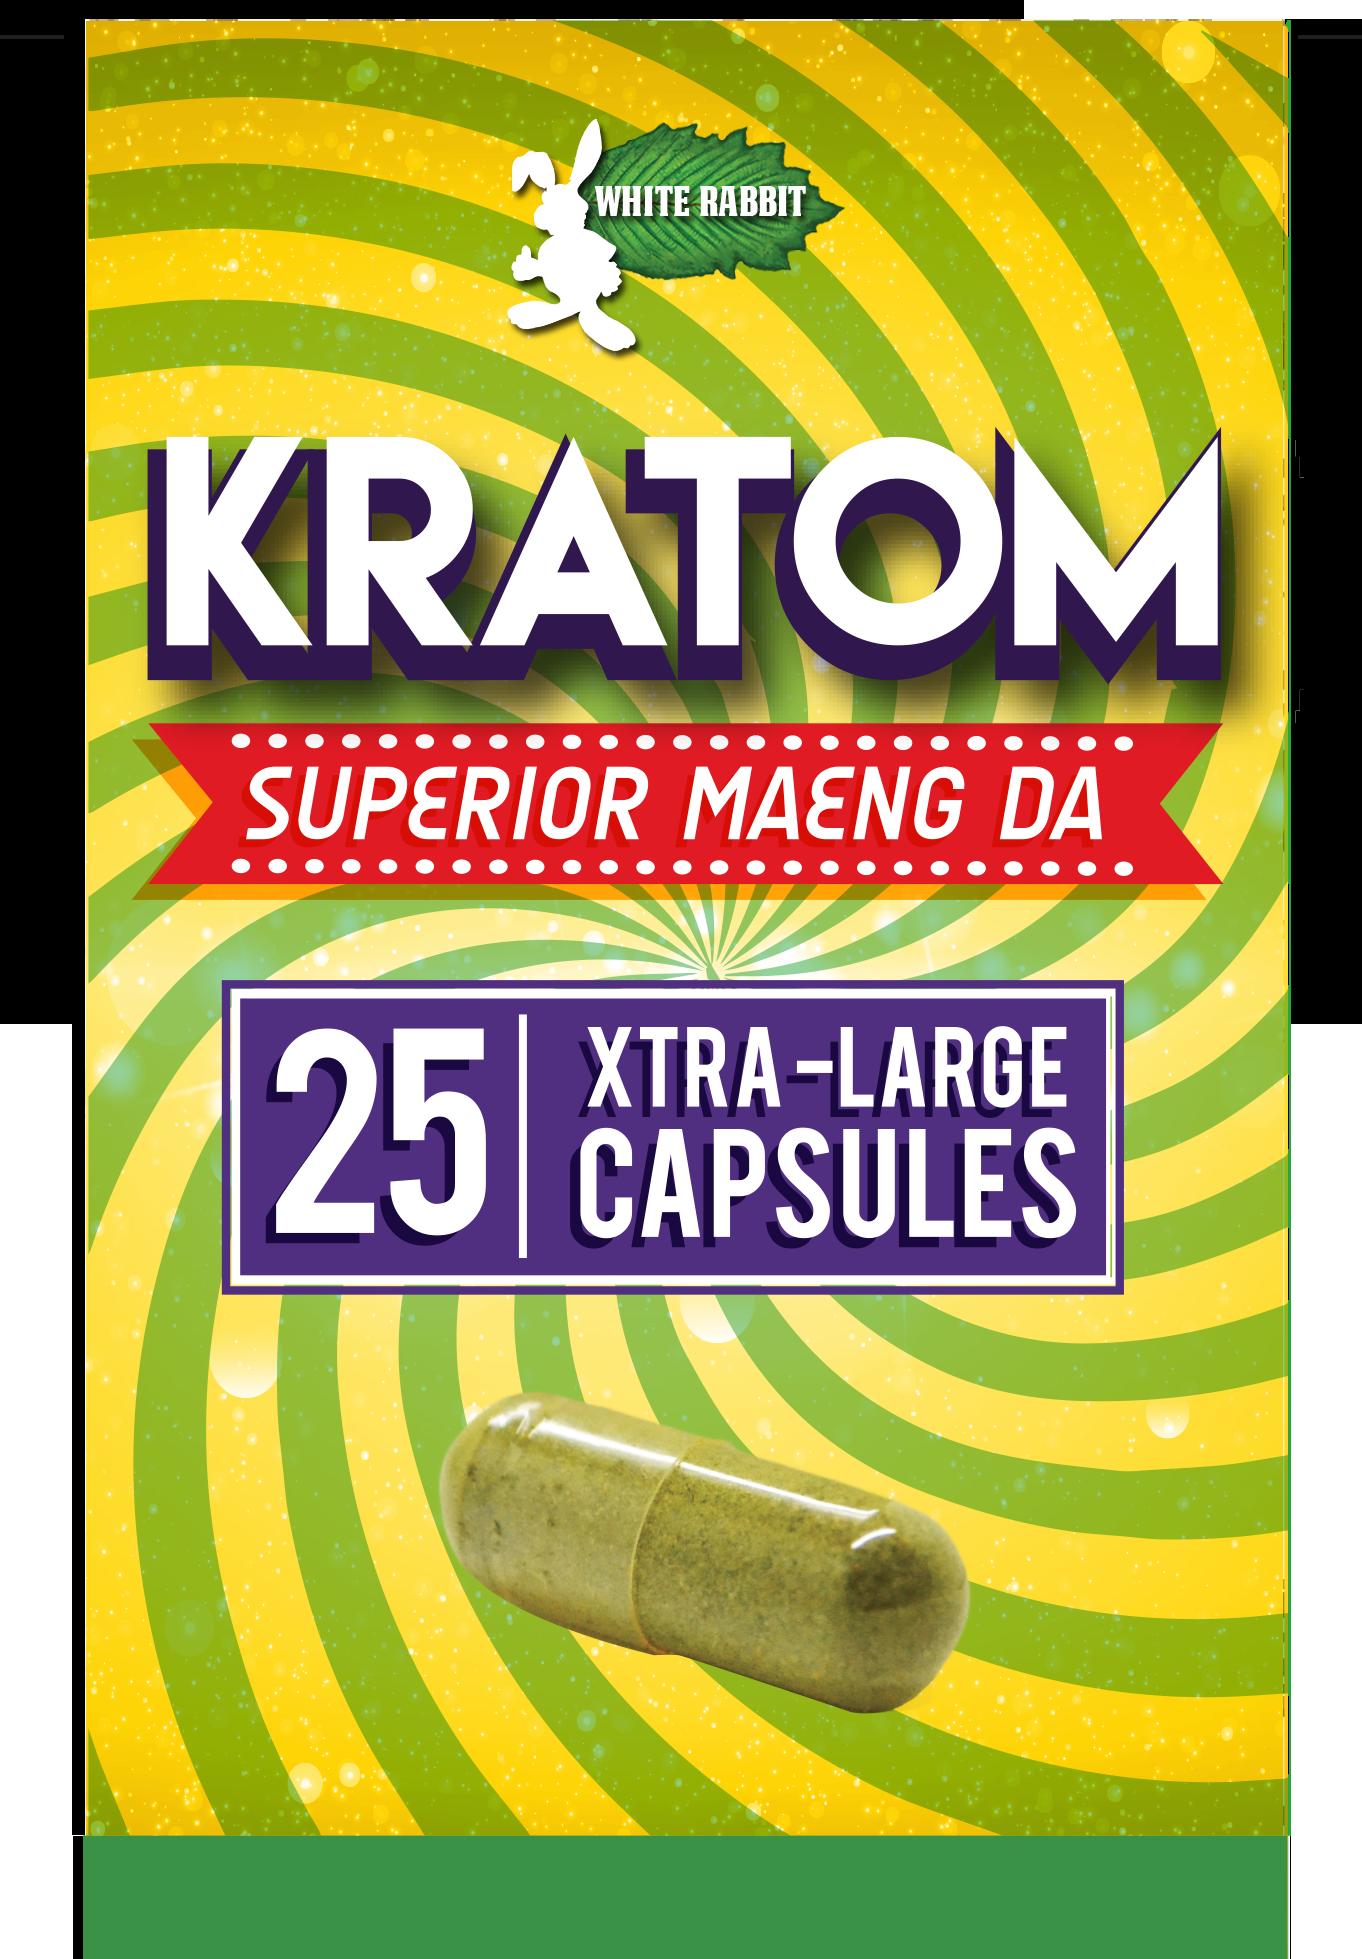 25 Maeng Da Capsules